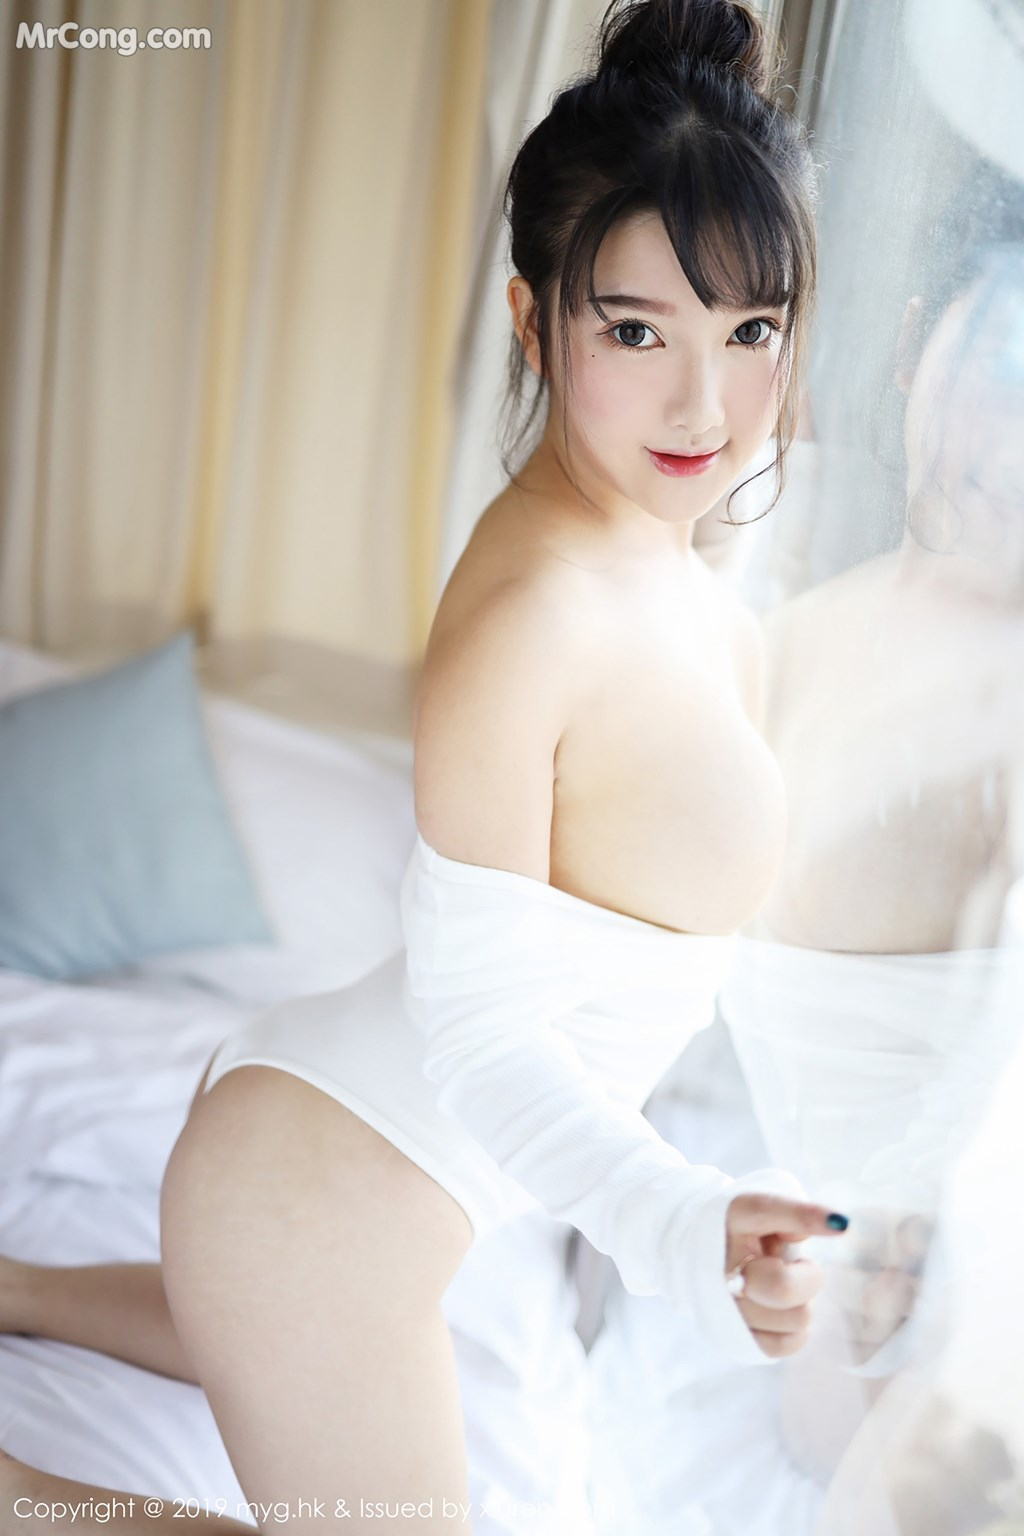 Image MyGirl-Vol.342-Xiao-You-Nai-MrCong.com-018 in post MyGirl Vol.342: Người mẫu Xiao You Nai (小尤奈) (41 ảnh)